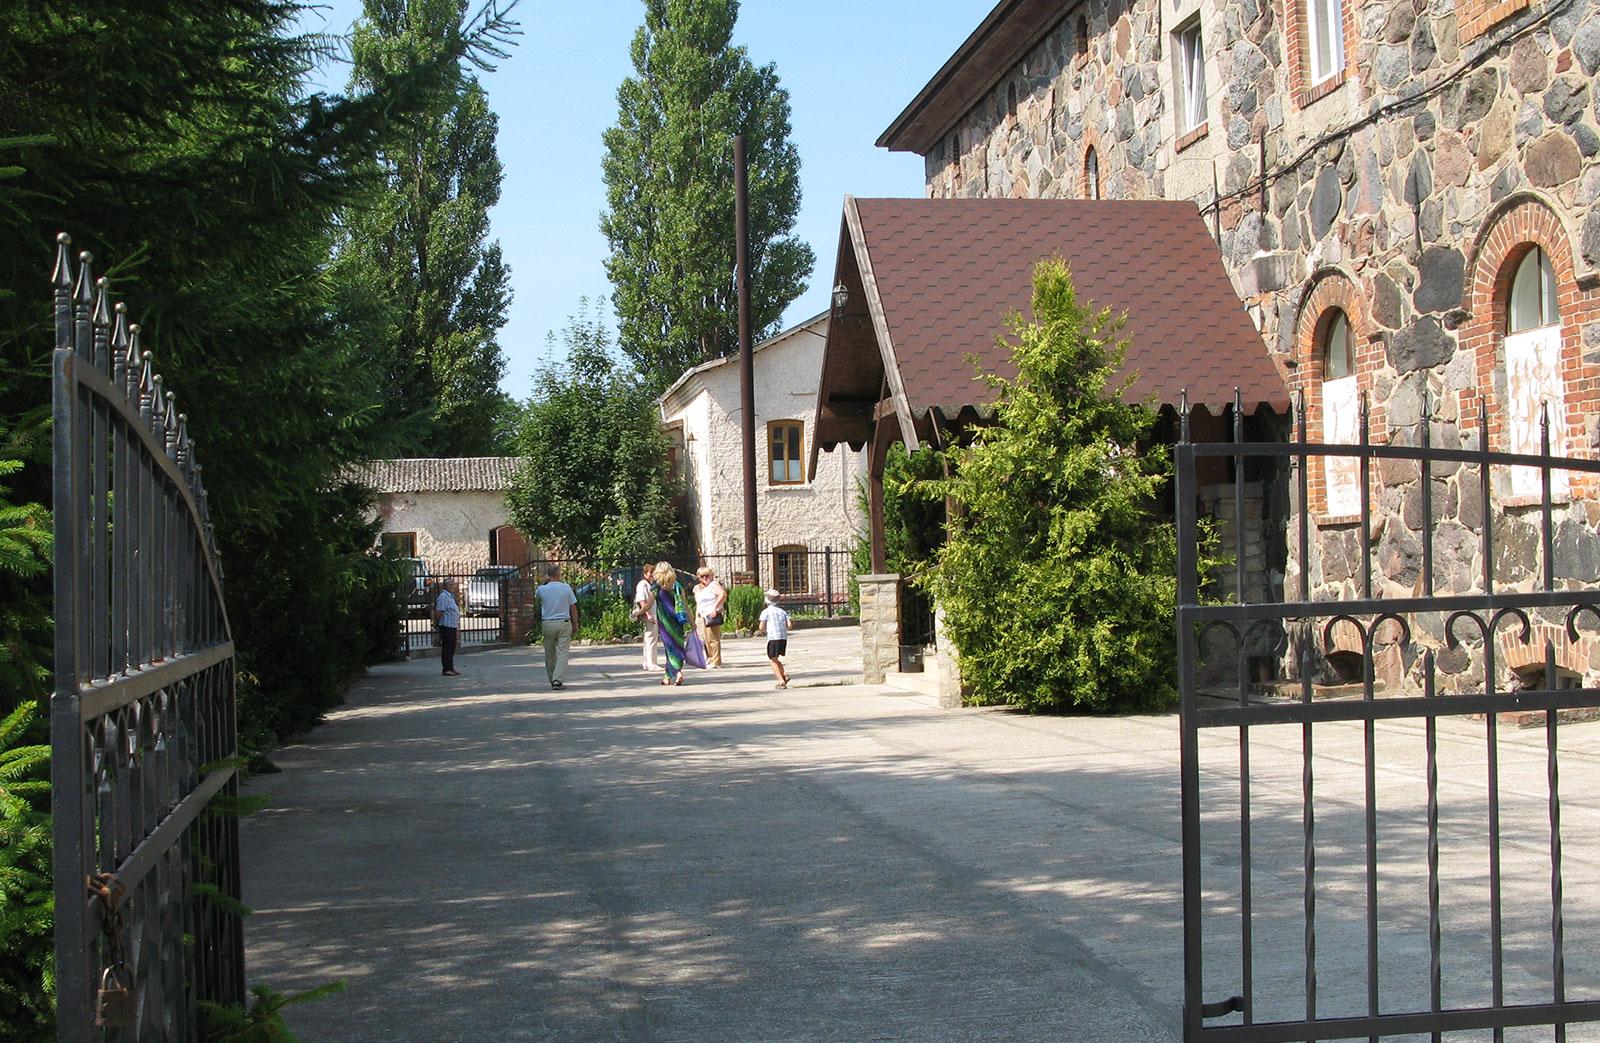 во дворе янтарного музея в Пальмникене